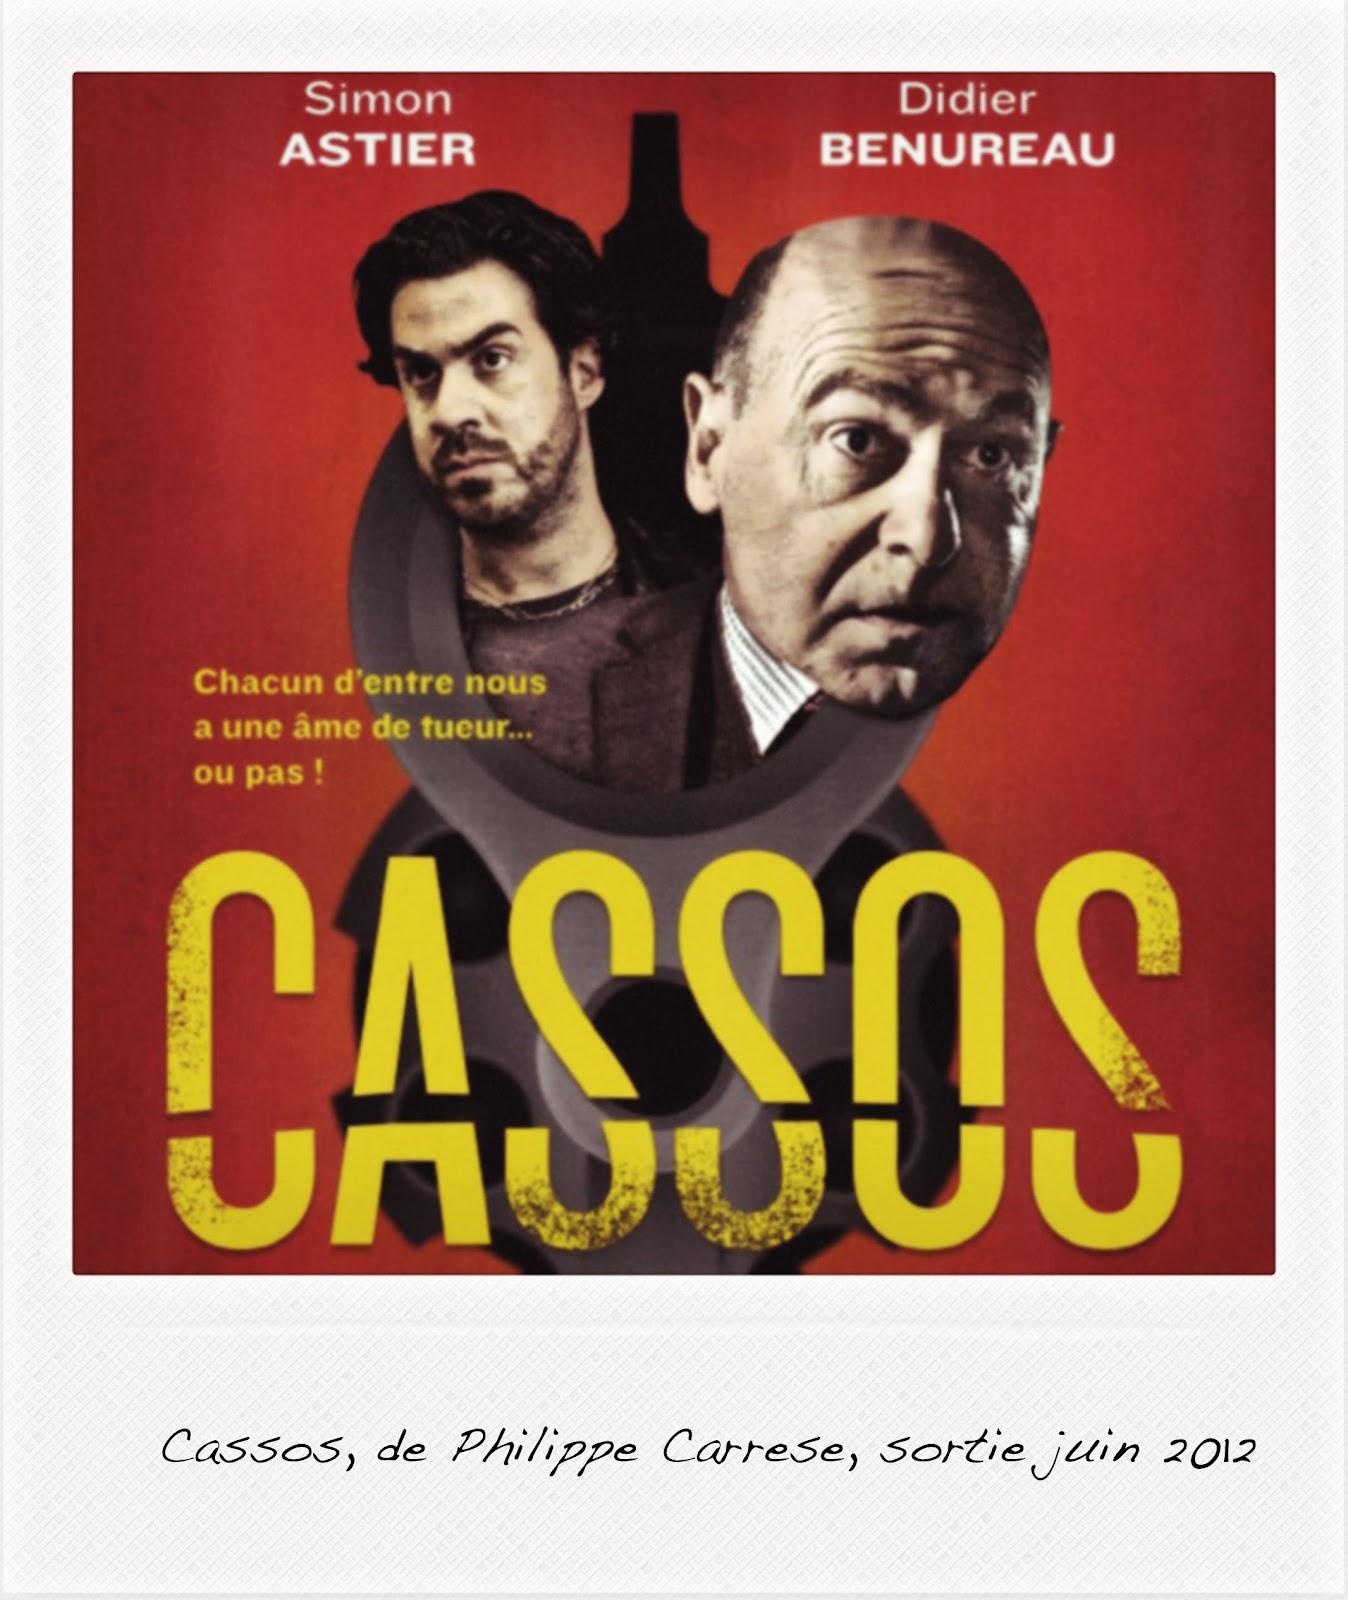 Cassos affiche